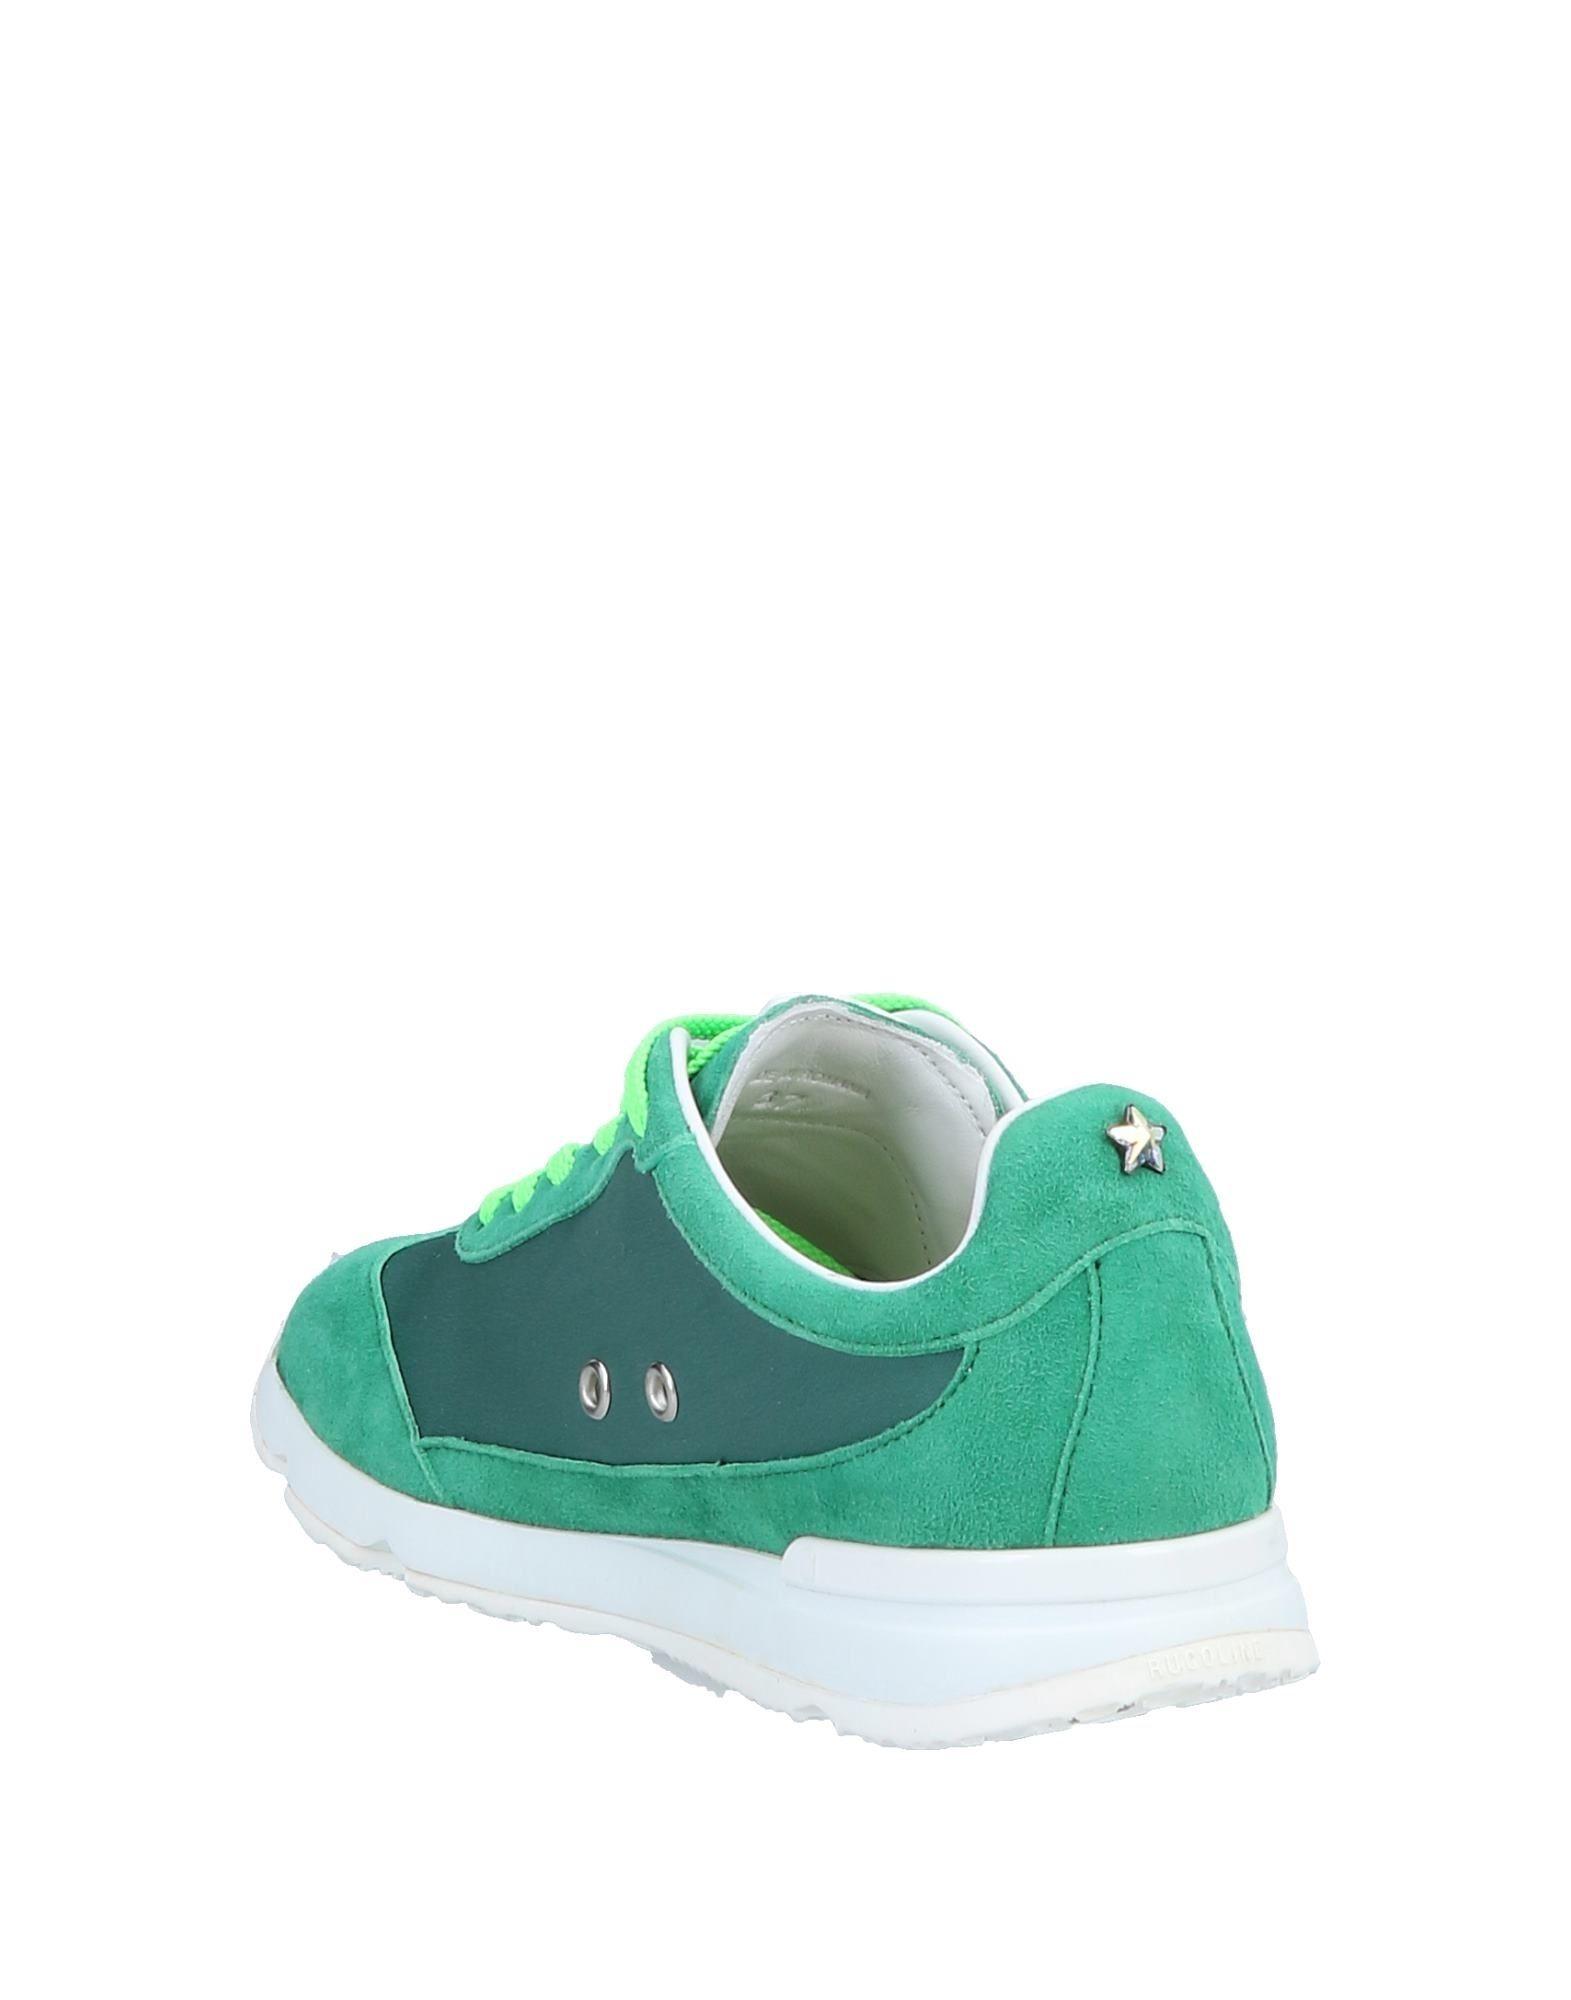 Gut um billige Schuhe Damen zu tragenRuco Line Sneakers Damen Schuhe  11559479JI 21fb62